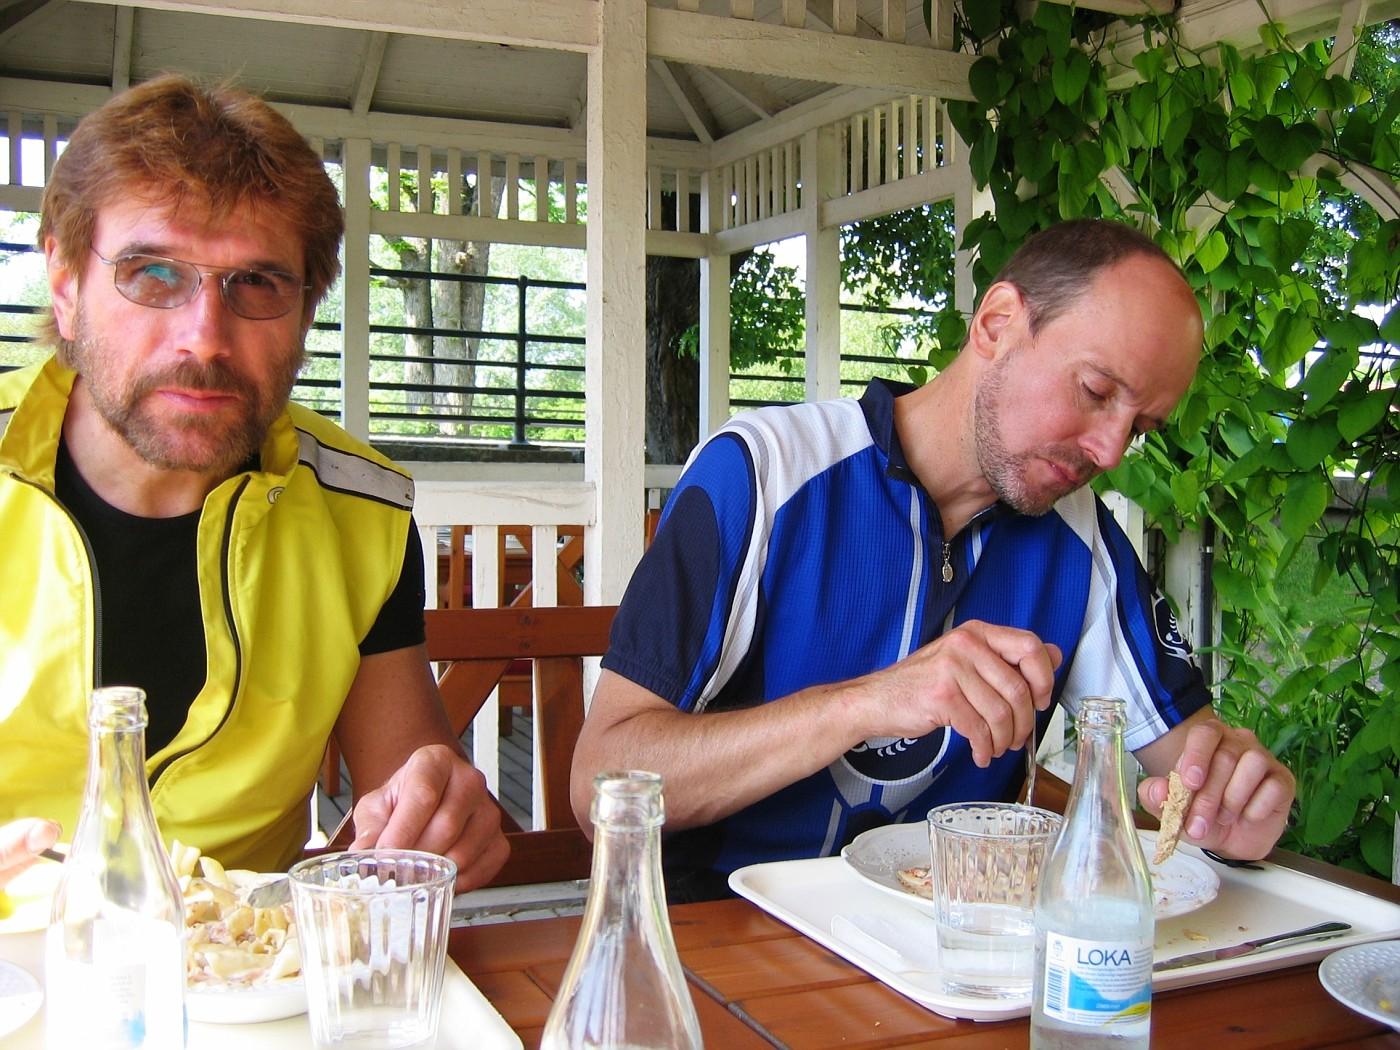 Manfred & Bernd Carbo loading